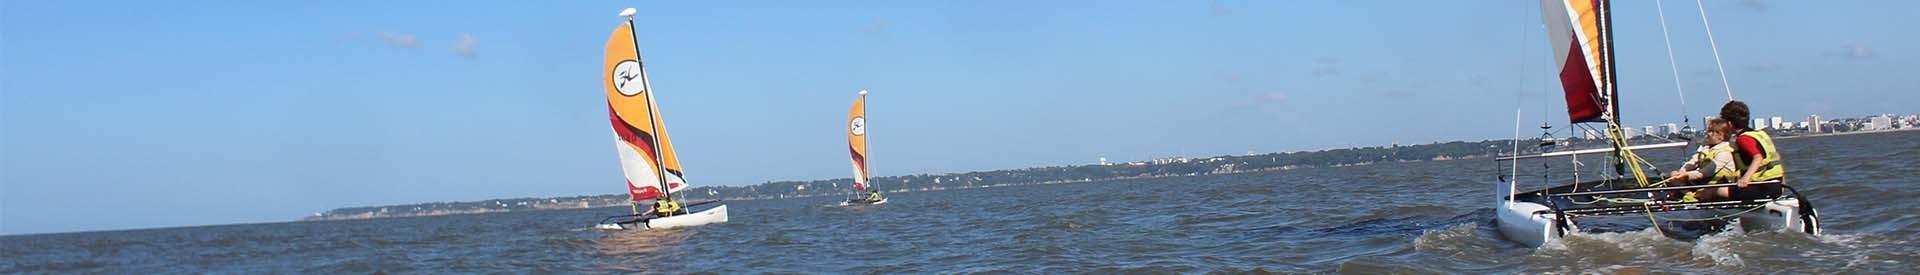 voile-legere-st-brevin-catamaran-nautisme-2-255